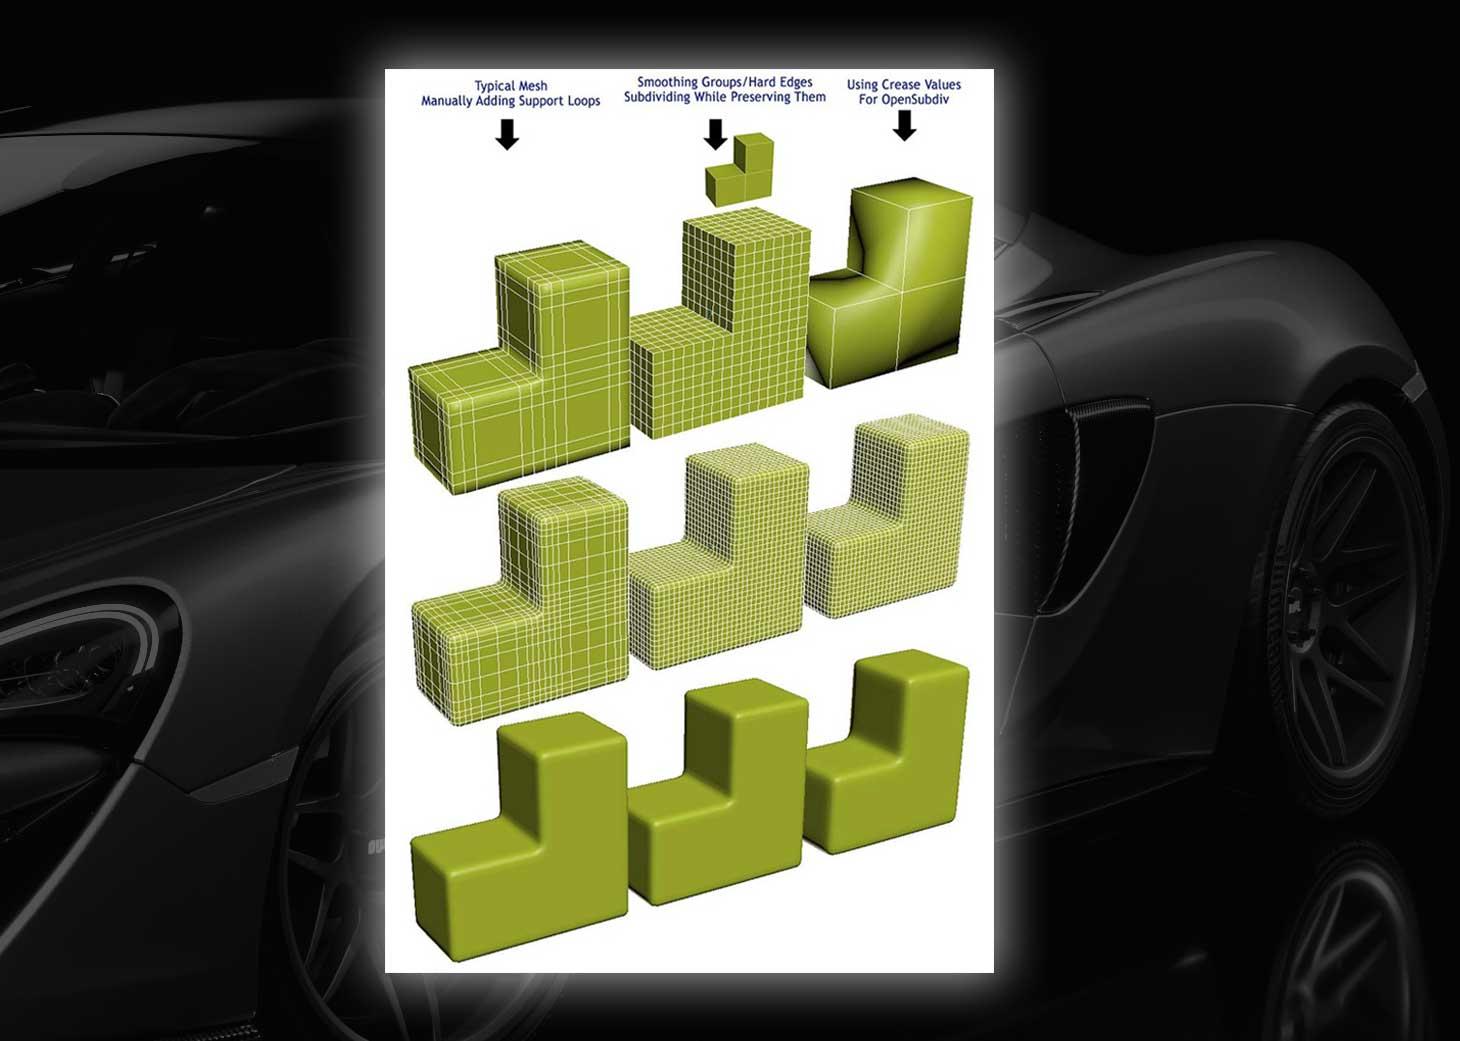 modeling using polygons car 3ds max maya17 - مدلسازی خودرو در تری دی مکس